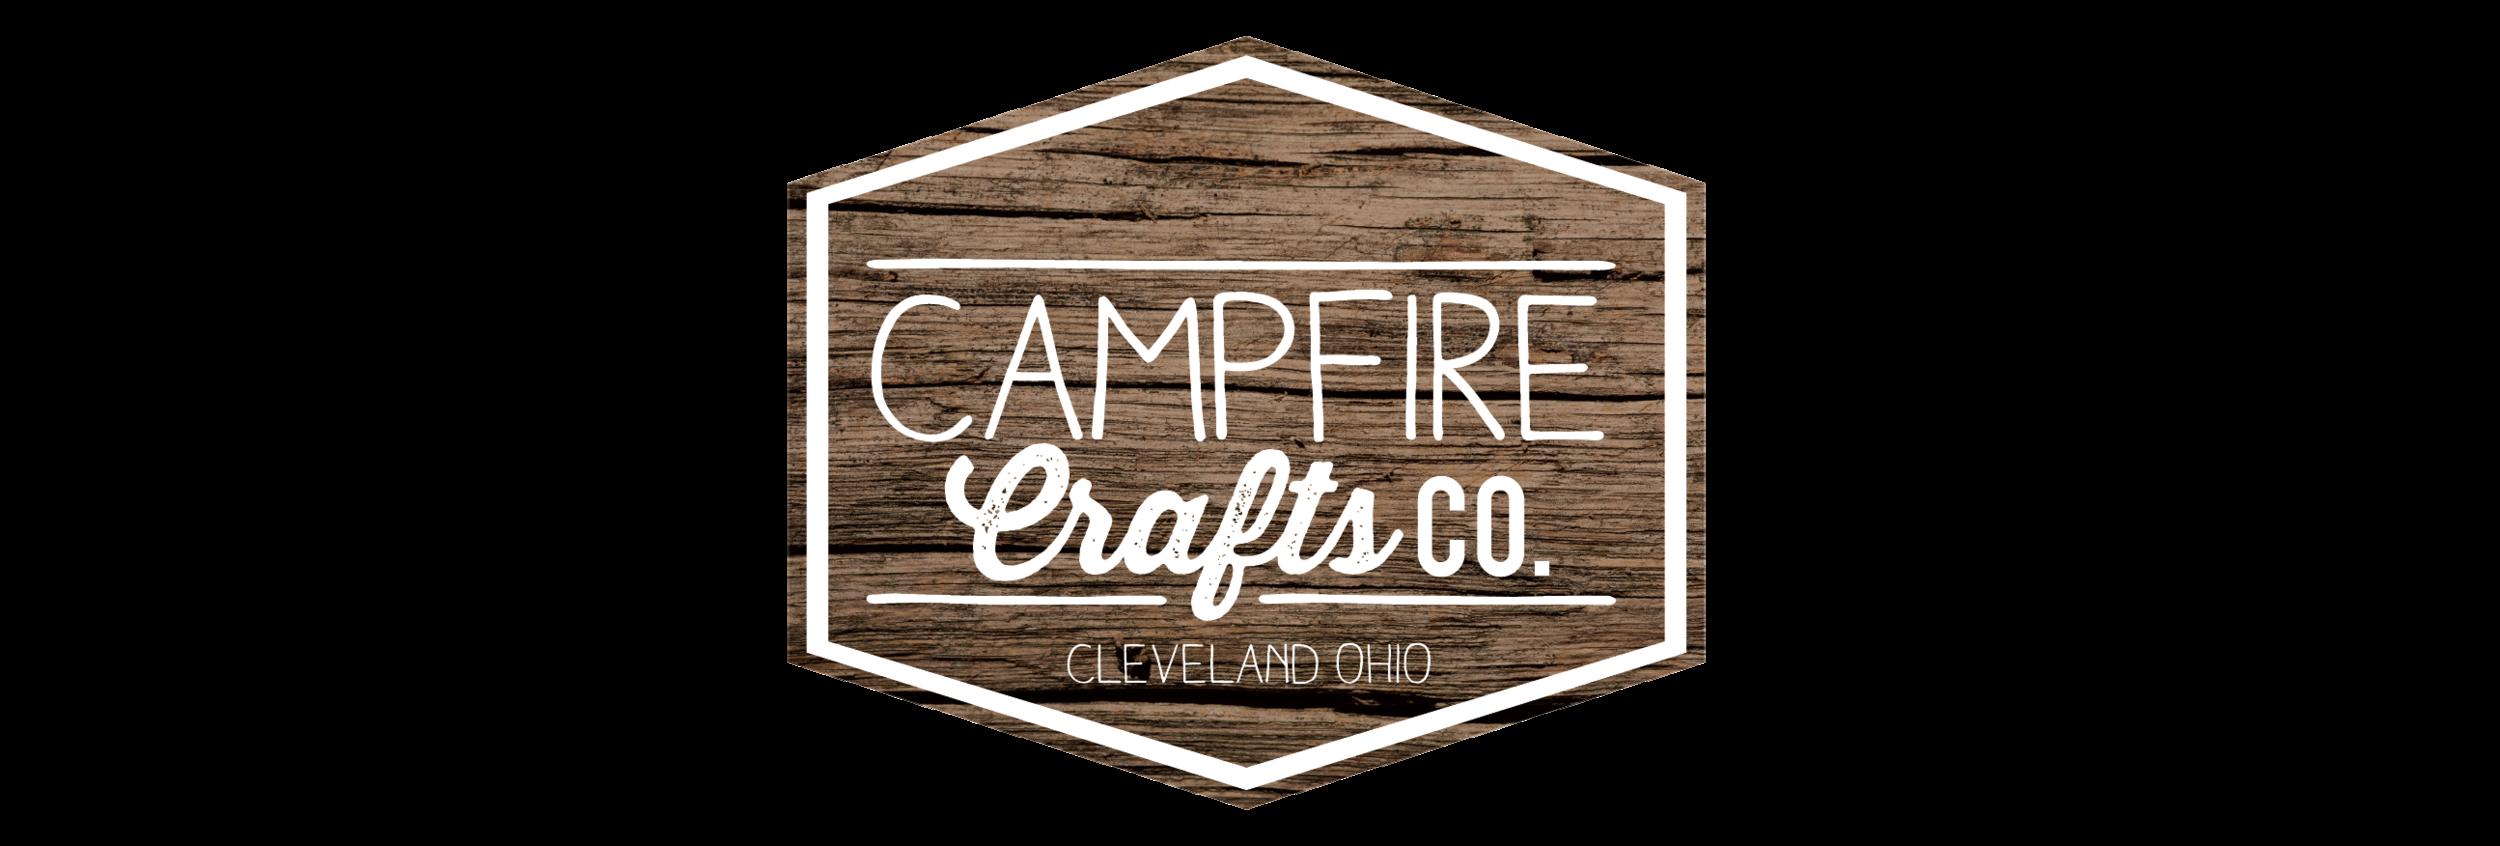 CAMPFIRE WEBSITE 2019-09.png